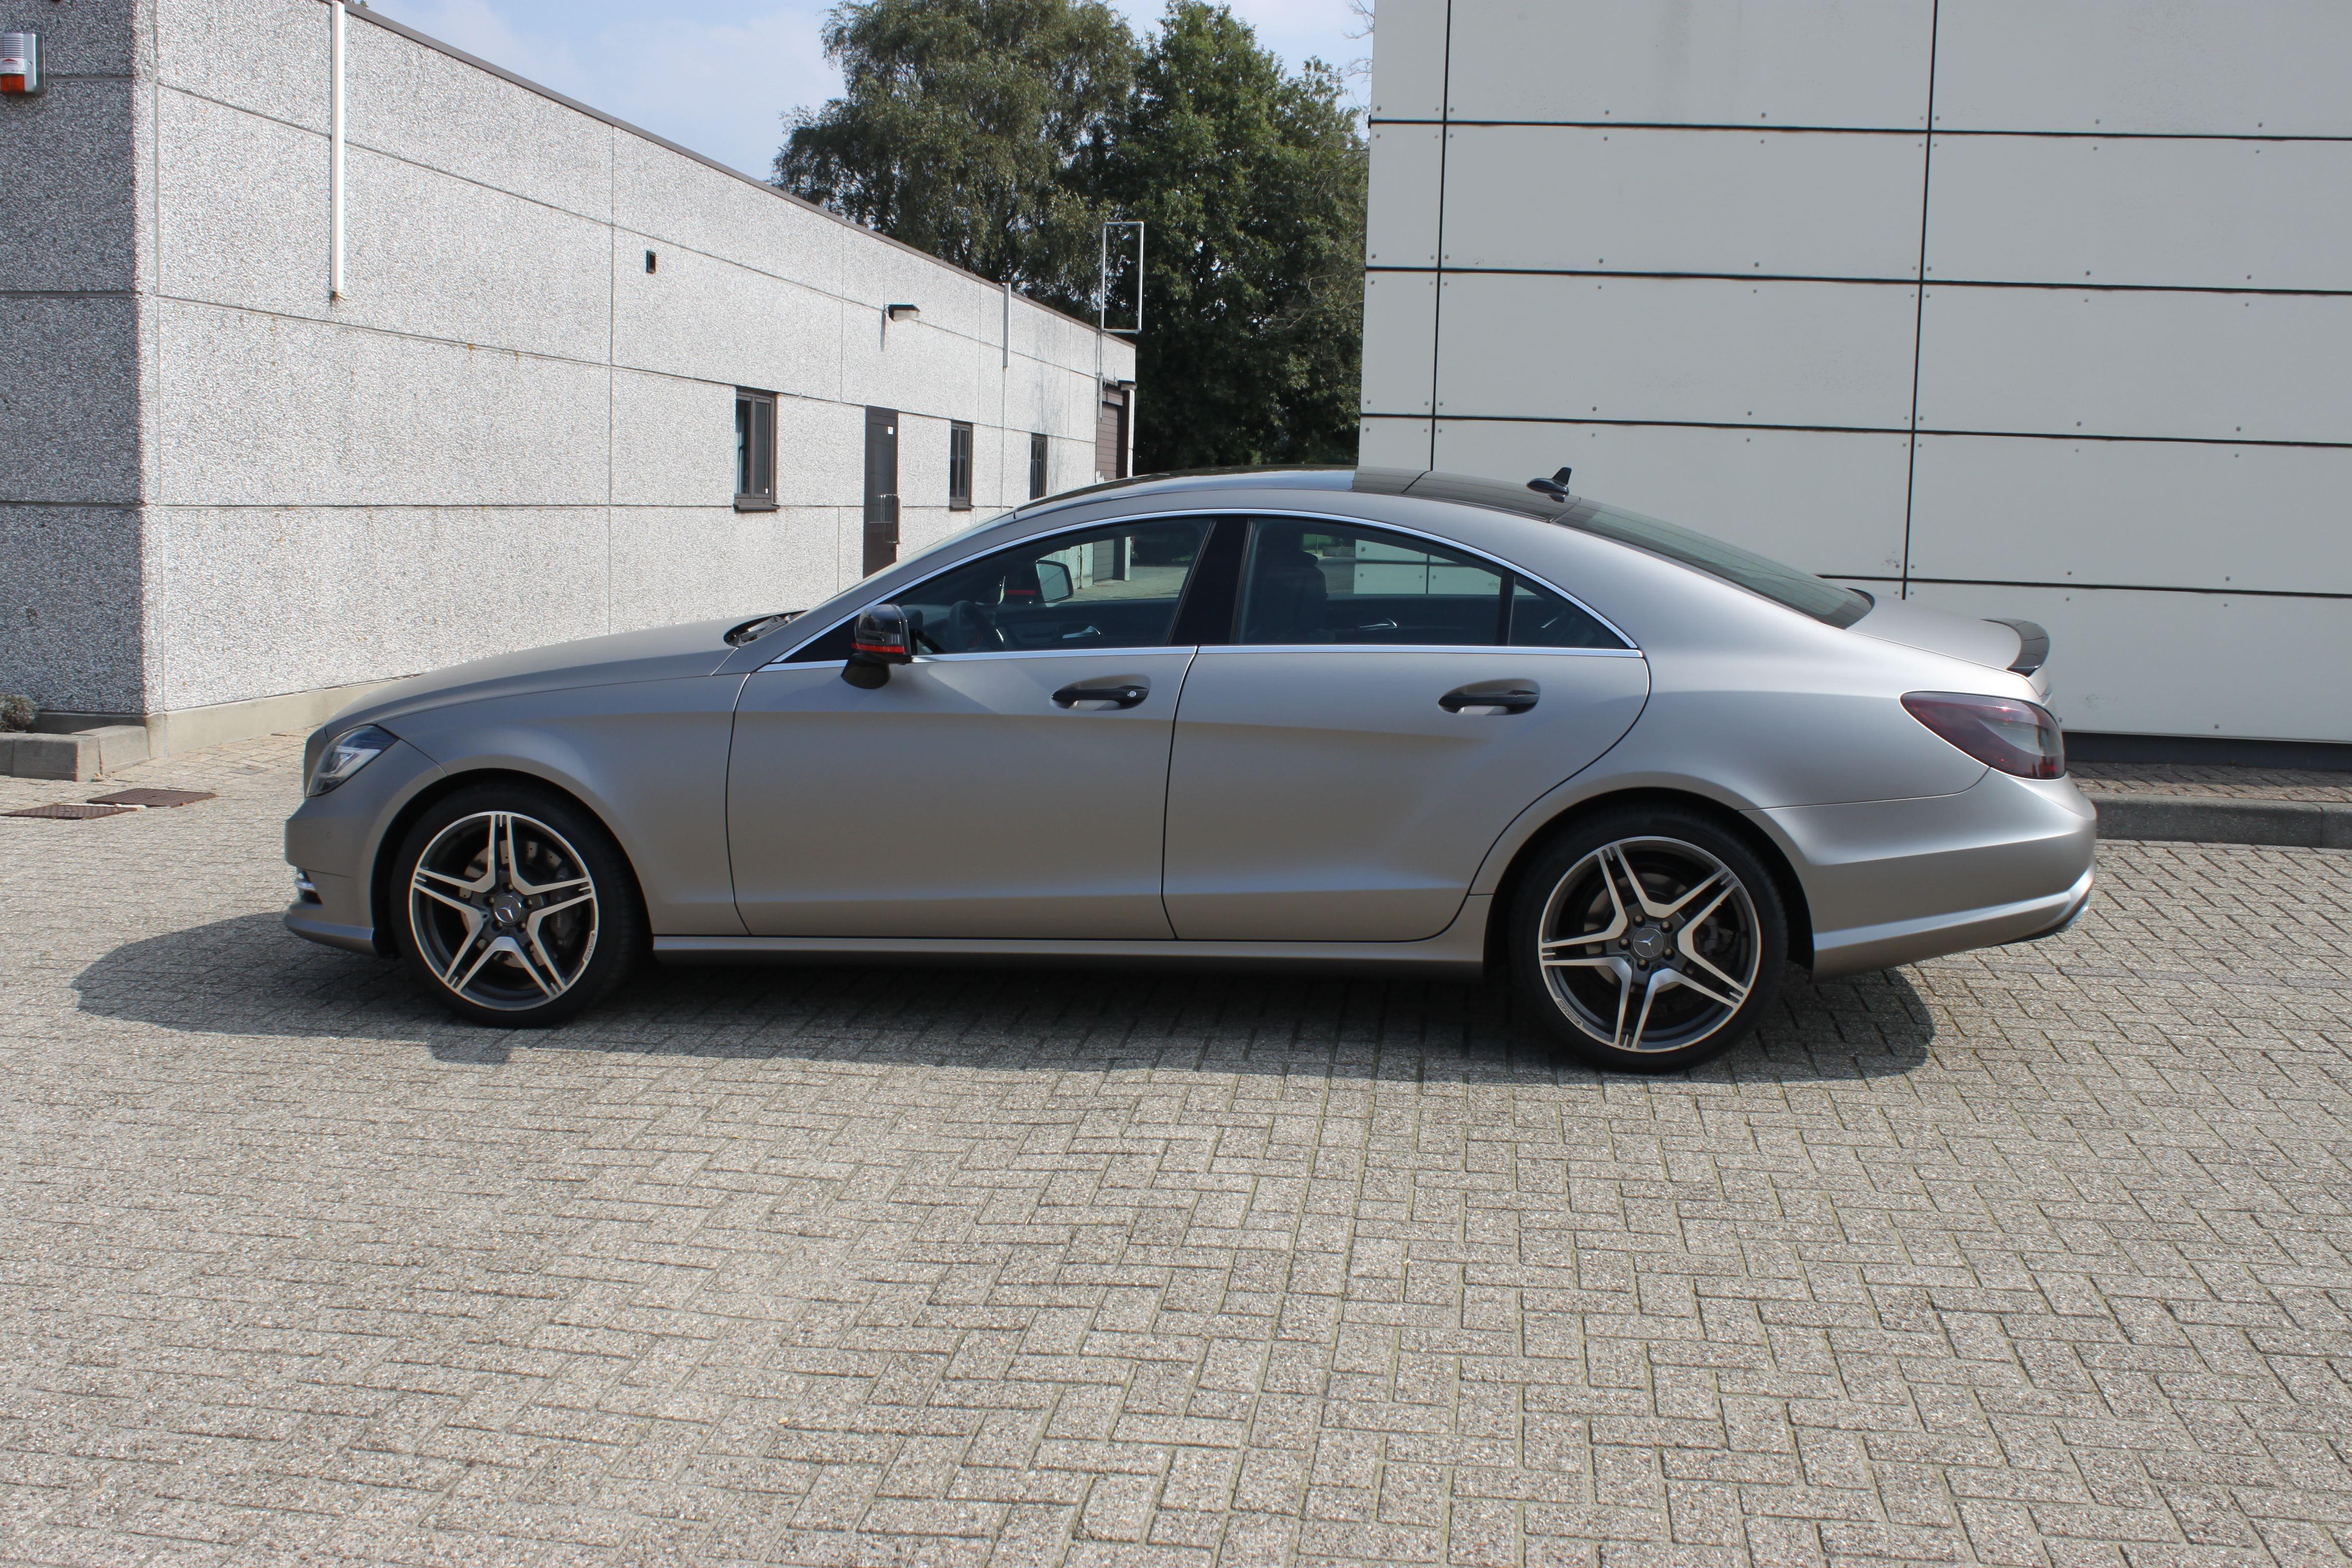 Mercedes CLS met Mat Grey Aluminium Wrap, Carwrapping door Wrapmyride.nu Foto-nr:6157, ©2020